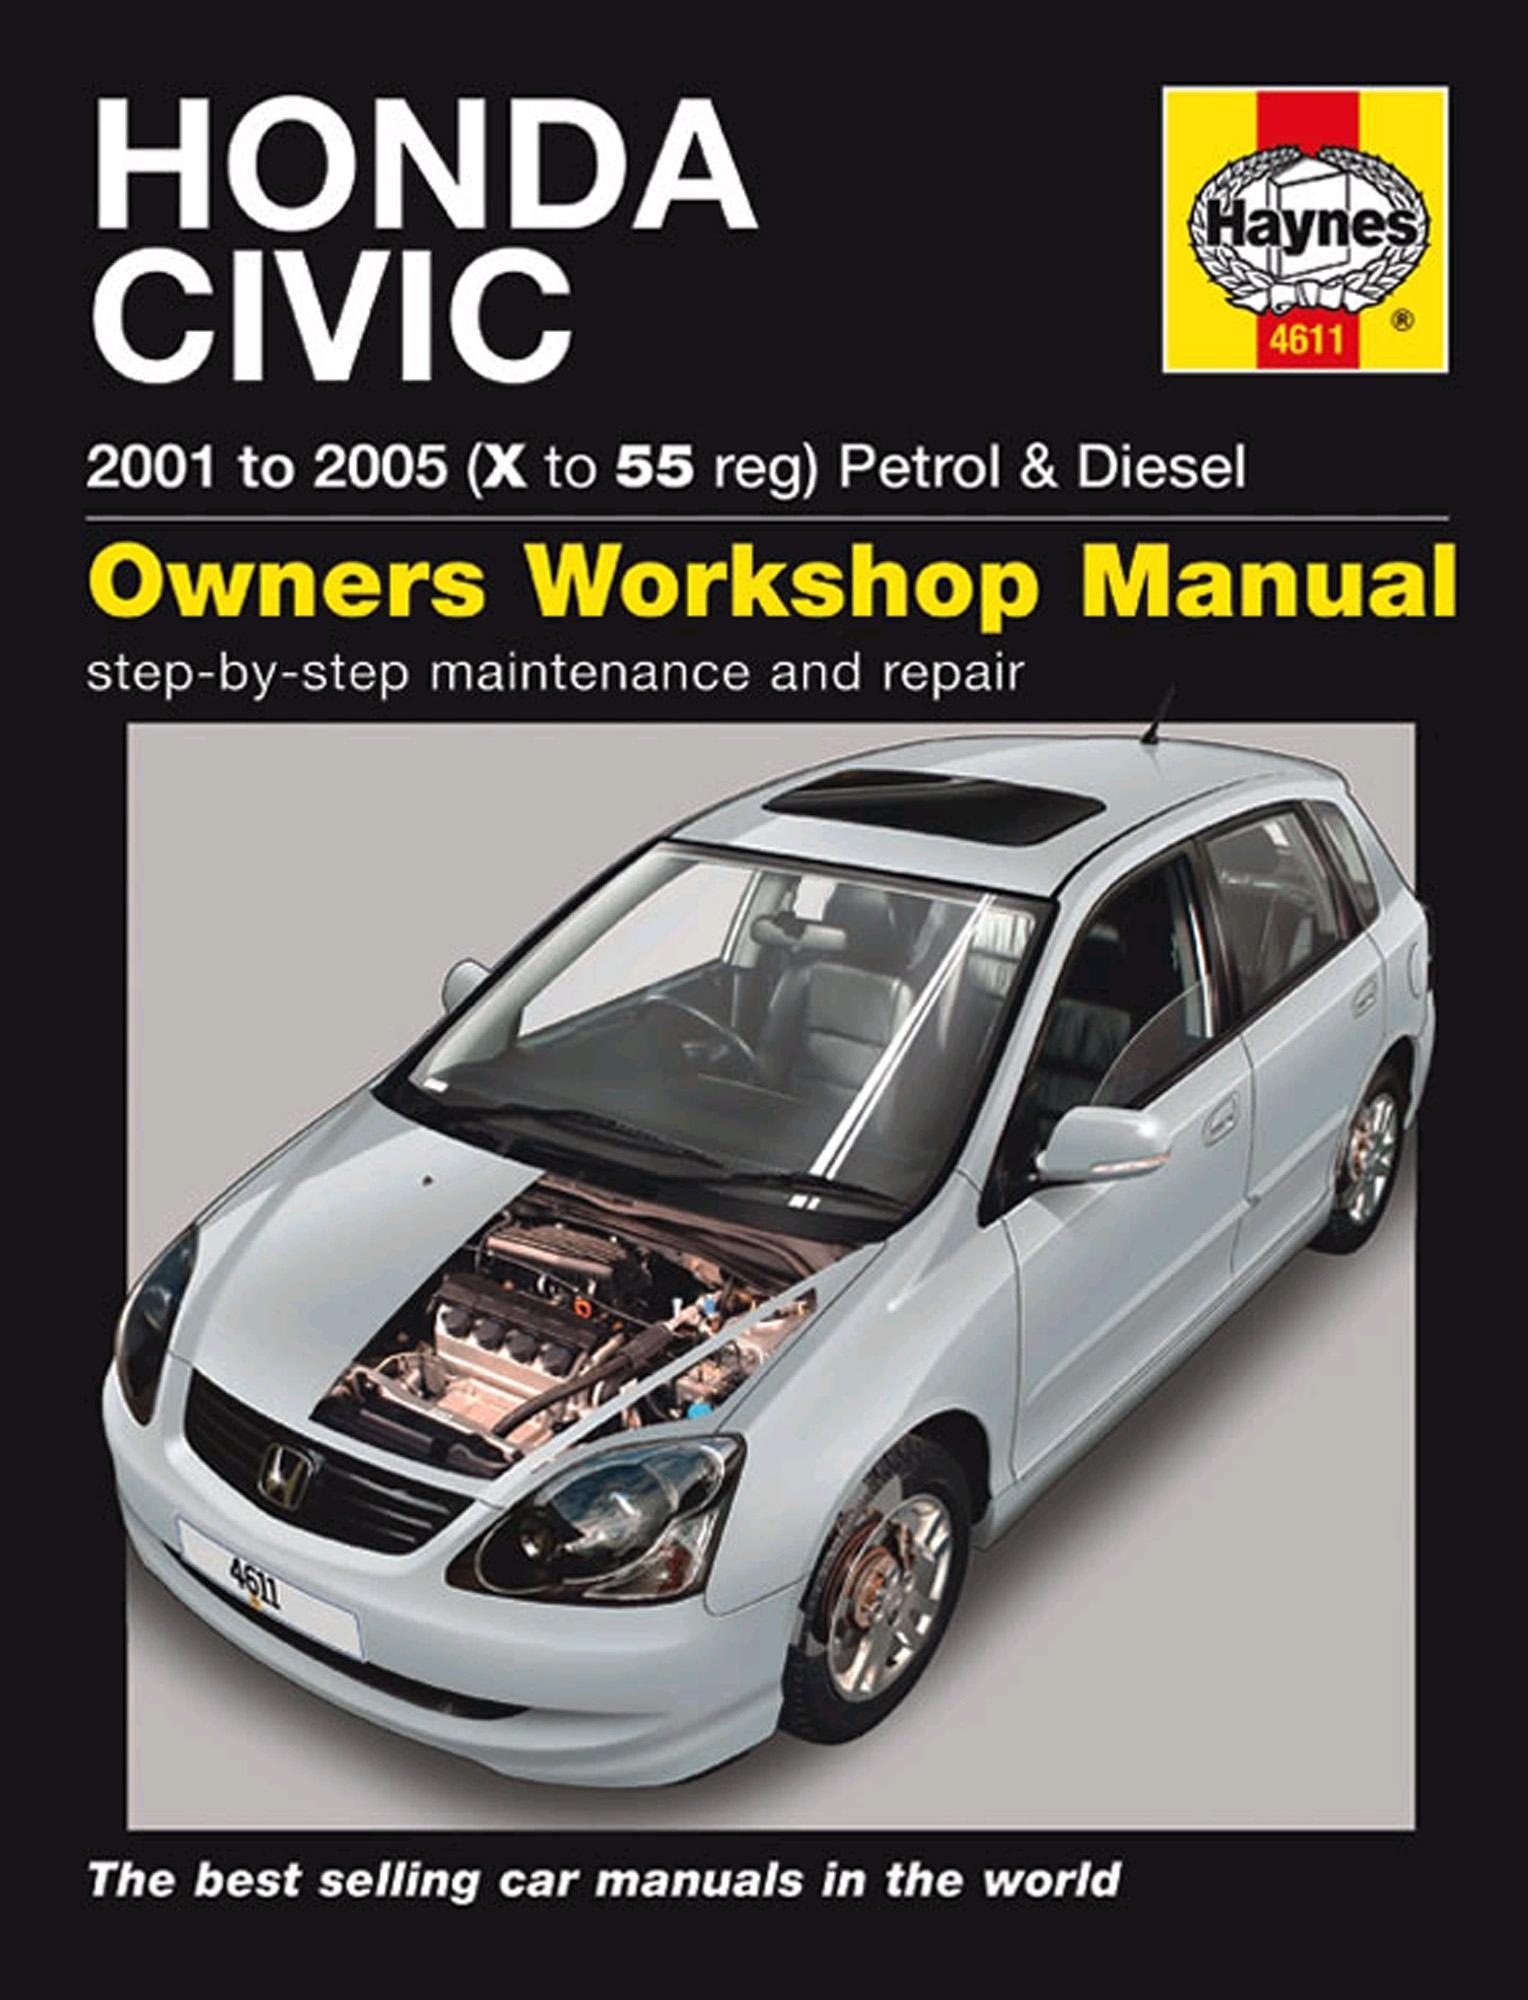 haynes honda civic 01 05 manual rh halfords com honda manuals online honda manuals download